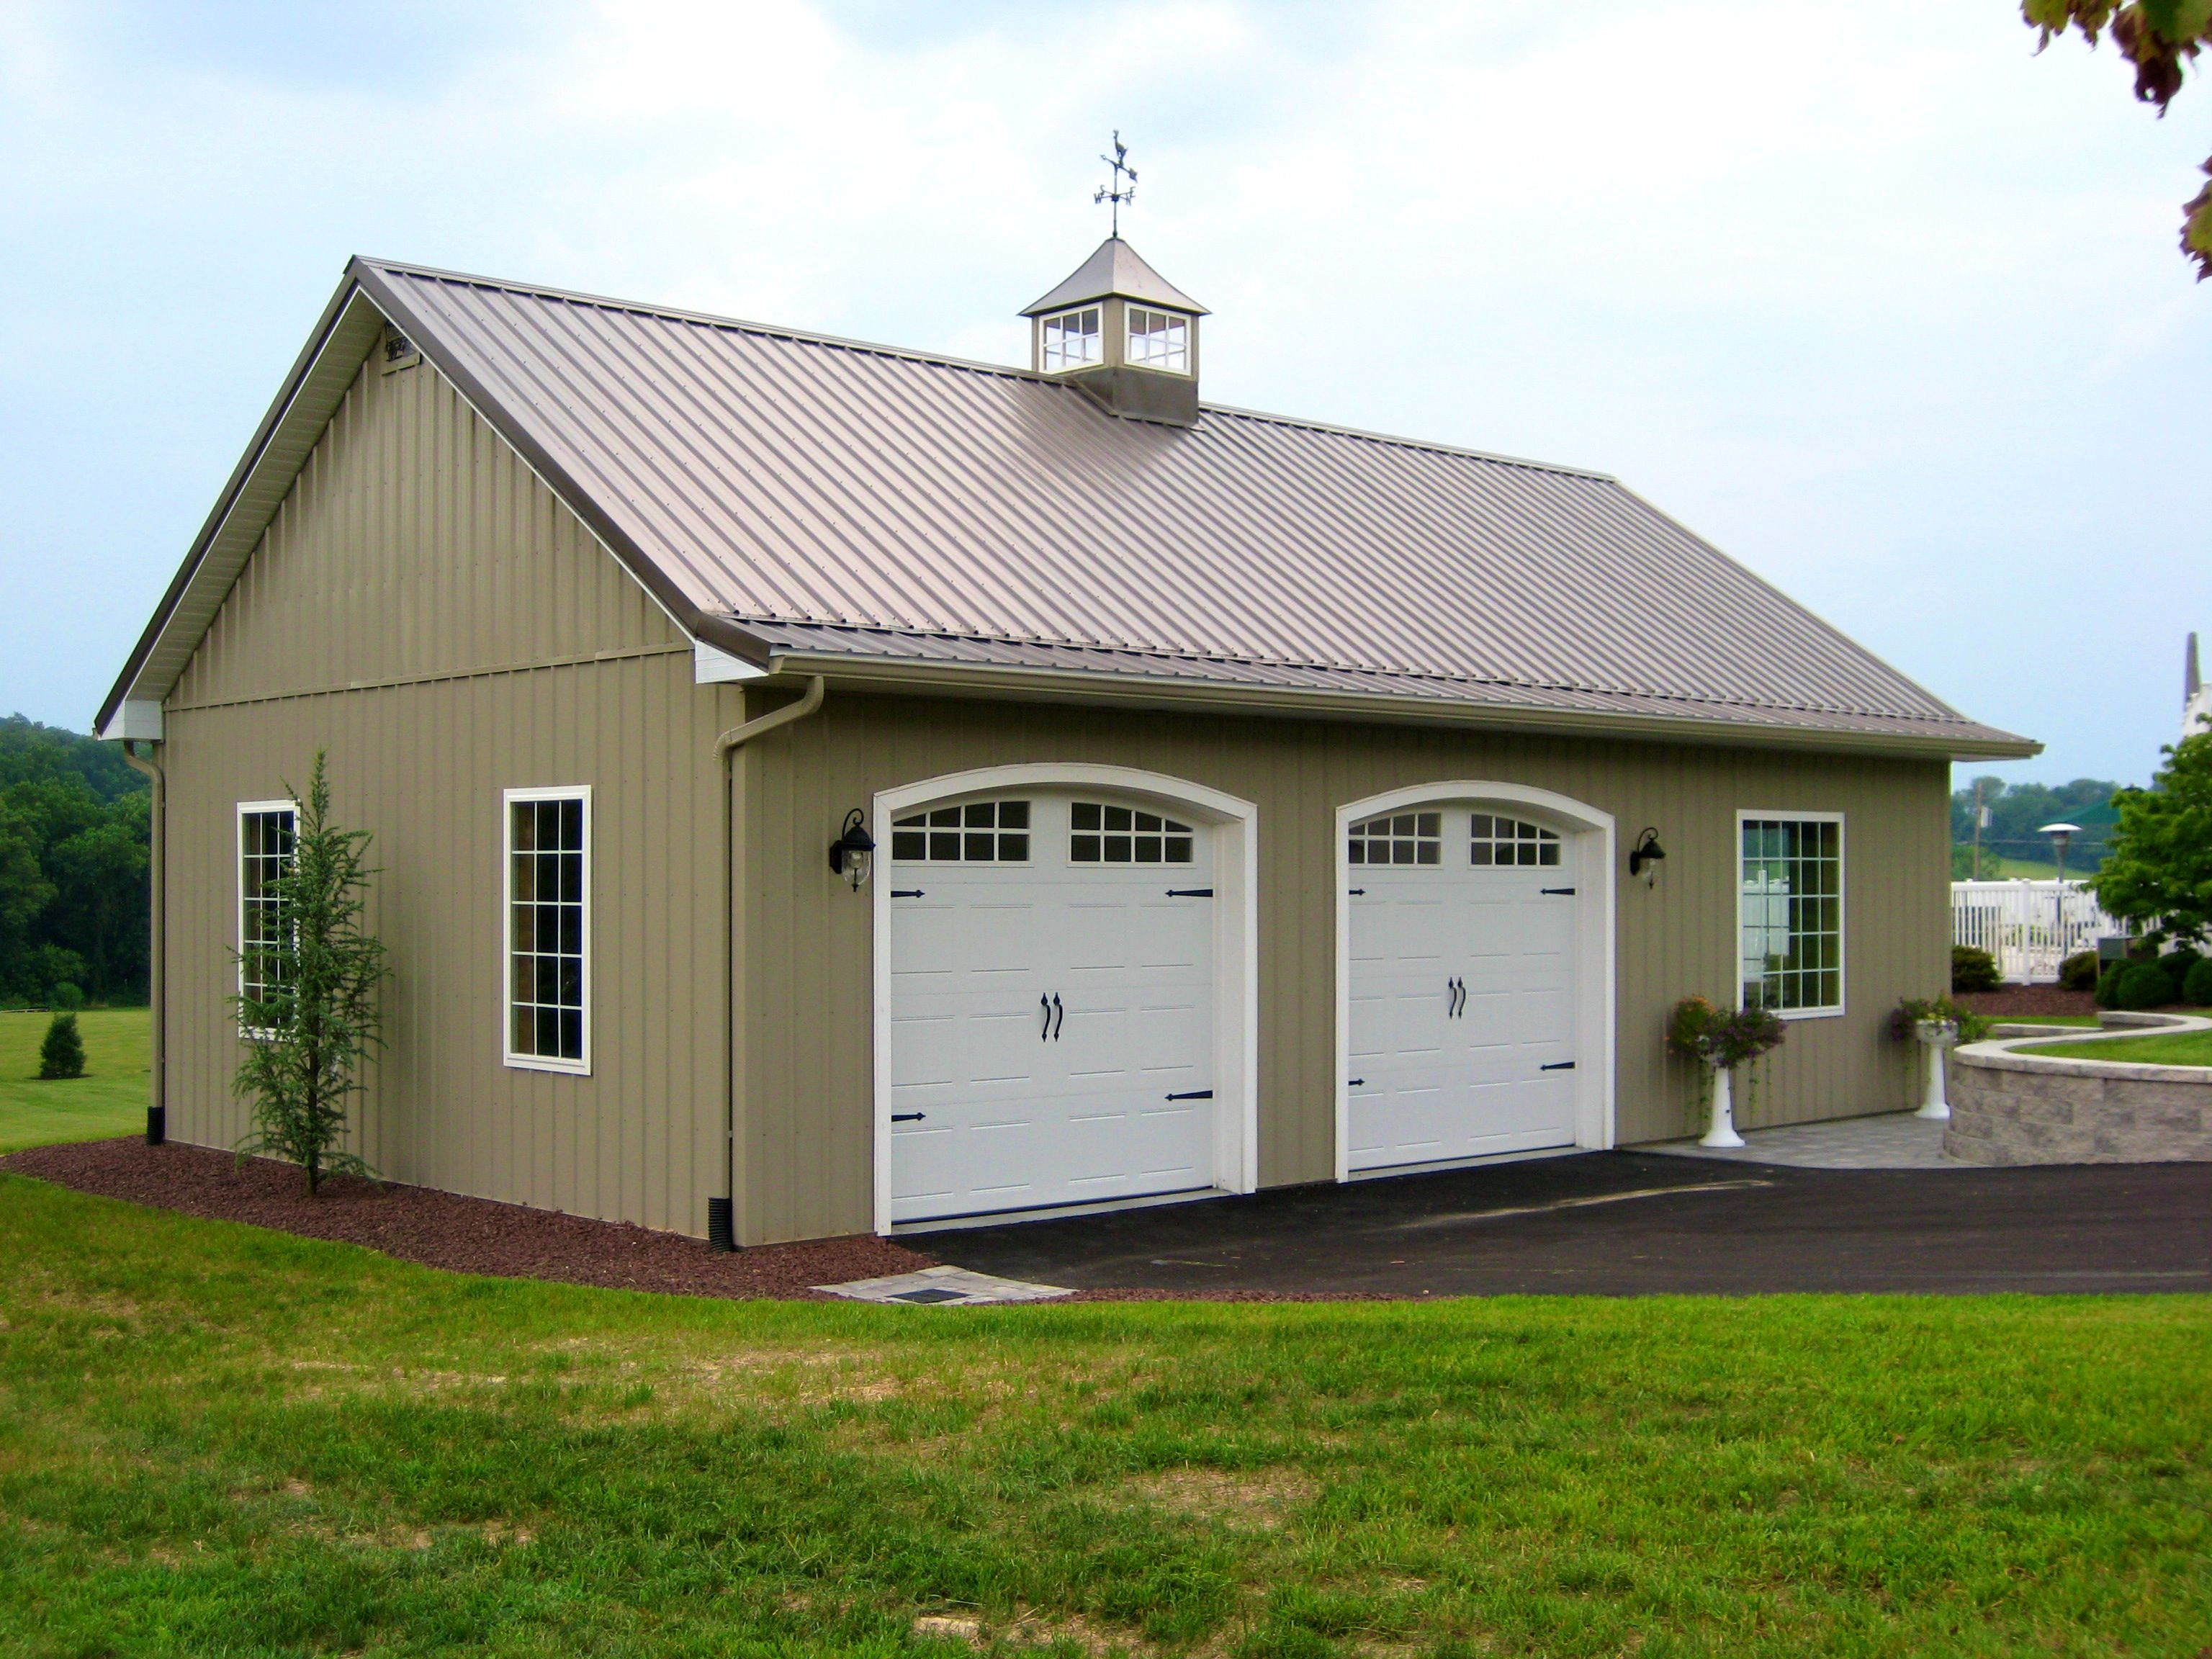 design install diy with doors your simple that trellis pole of has door barn kits loft how to decorative over nice the inside aluminum garage